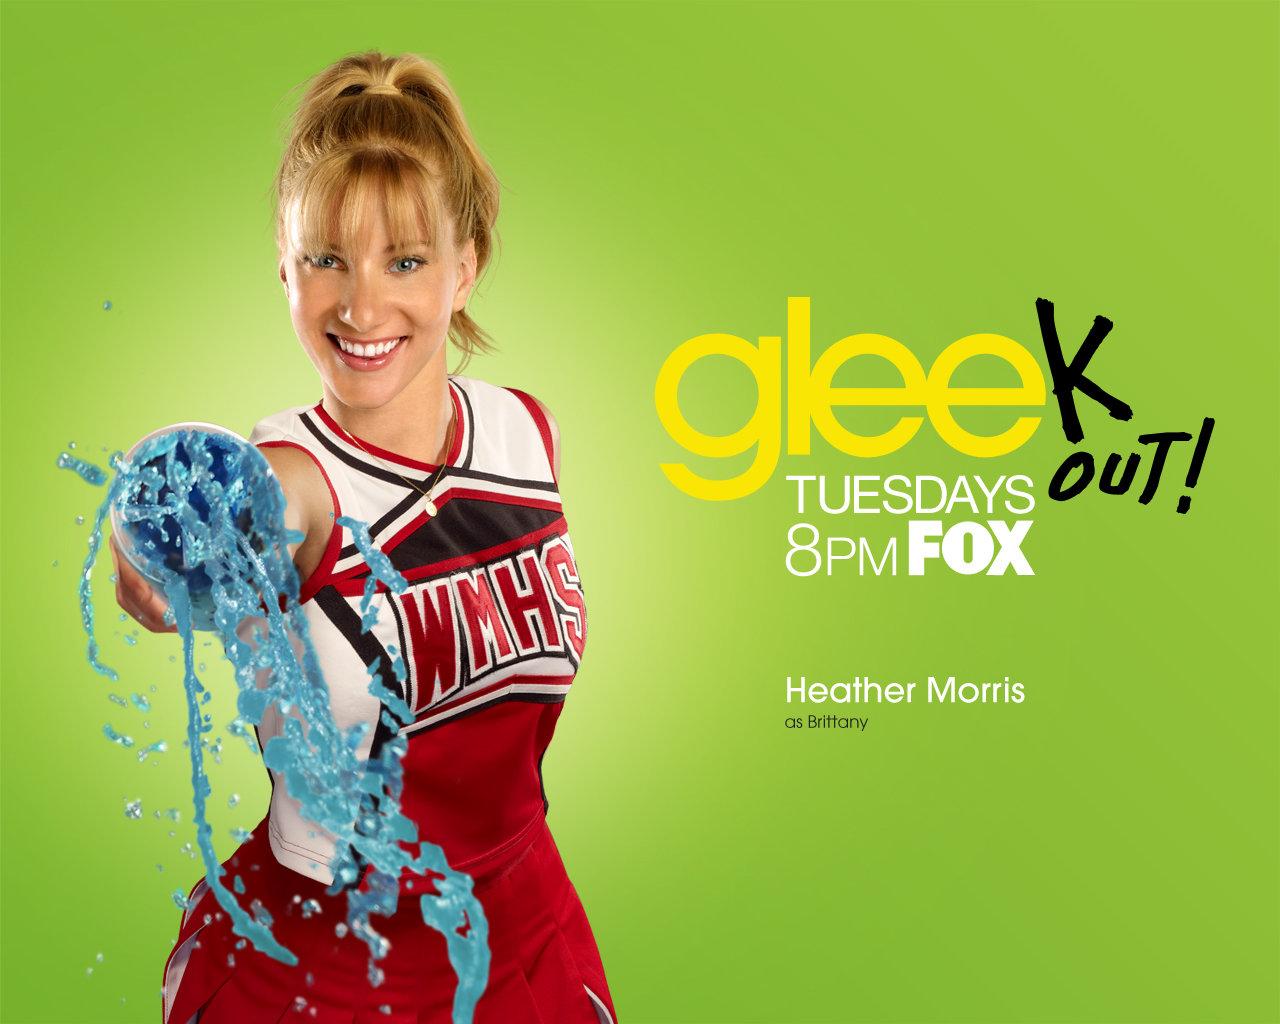 Glee Wallpapers Hd For Desktop Backgrounds